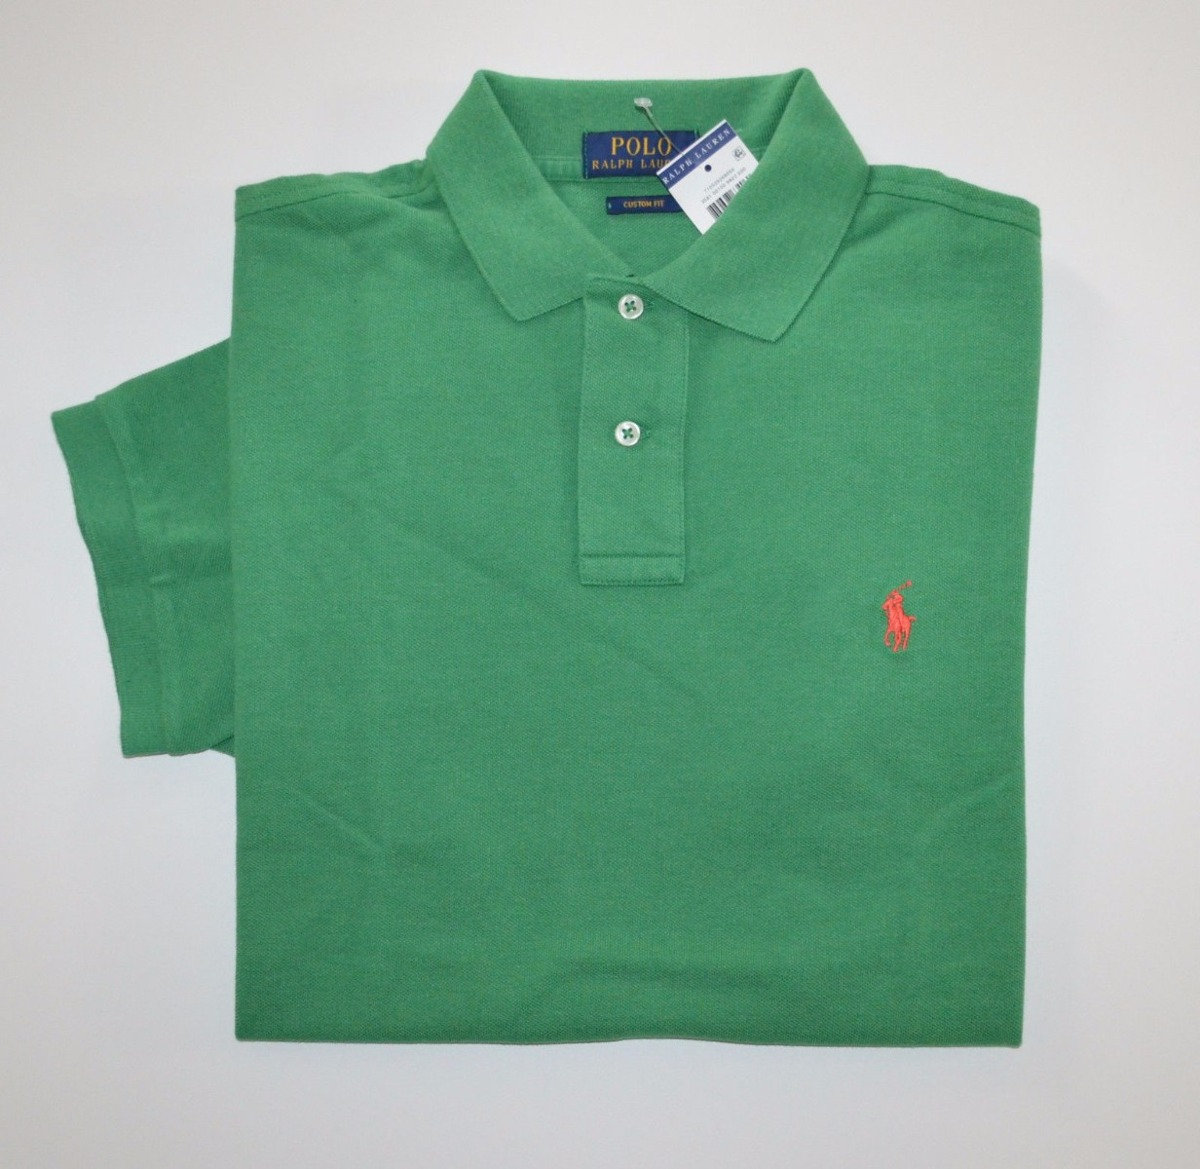 ... australia camisa polo ralph lauren tamanho g l original custom fit. carregando  zoom. 618b1 2f80e 866f082bdc7